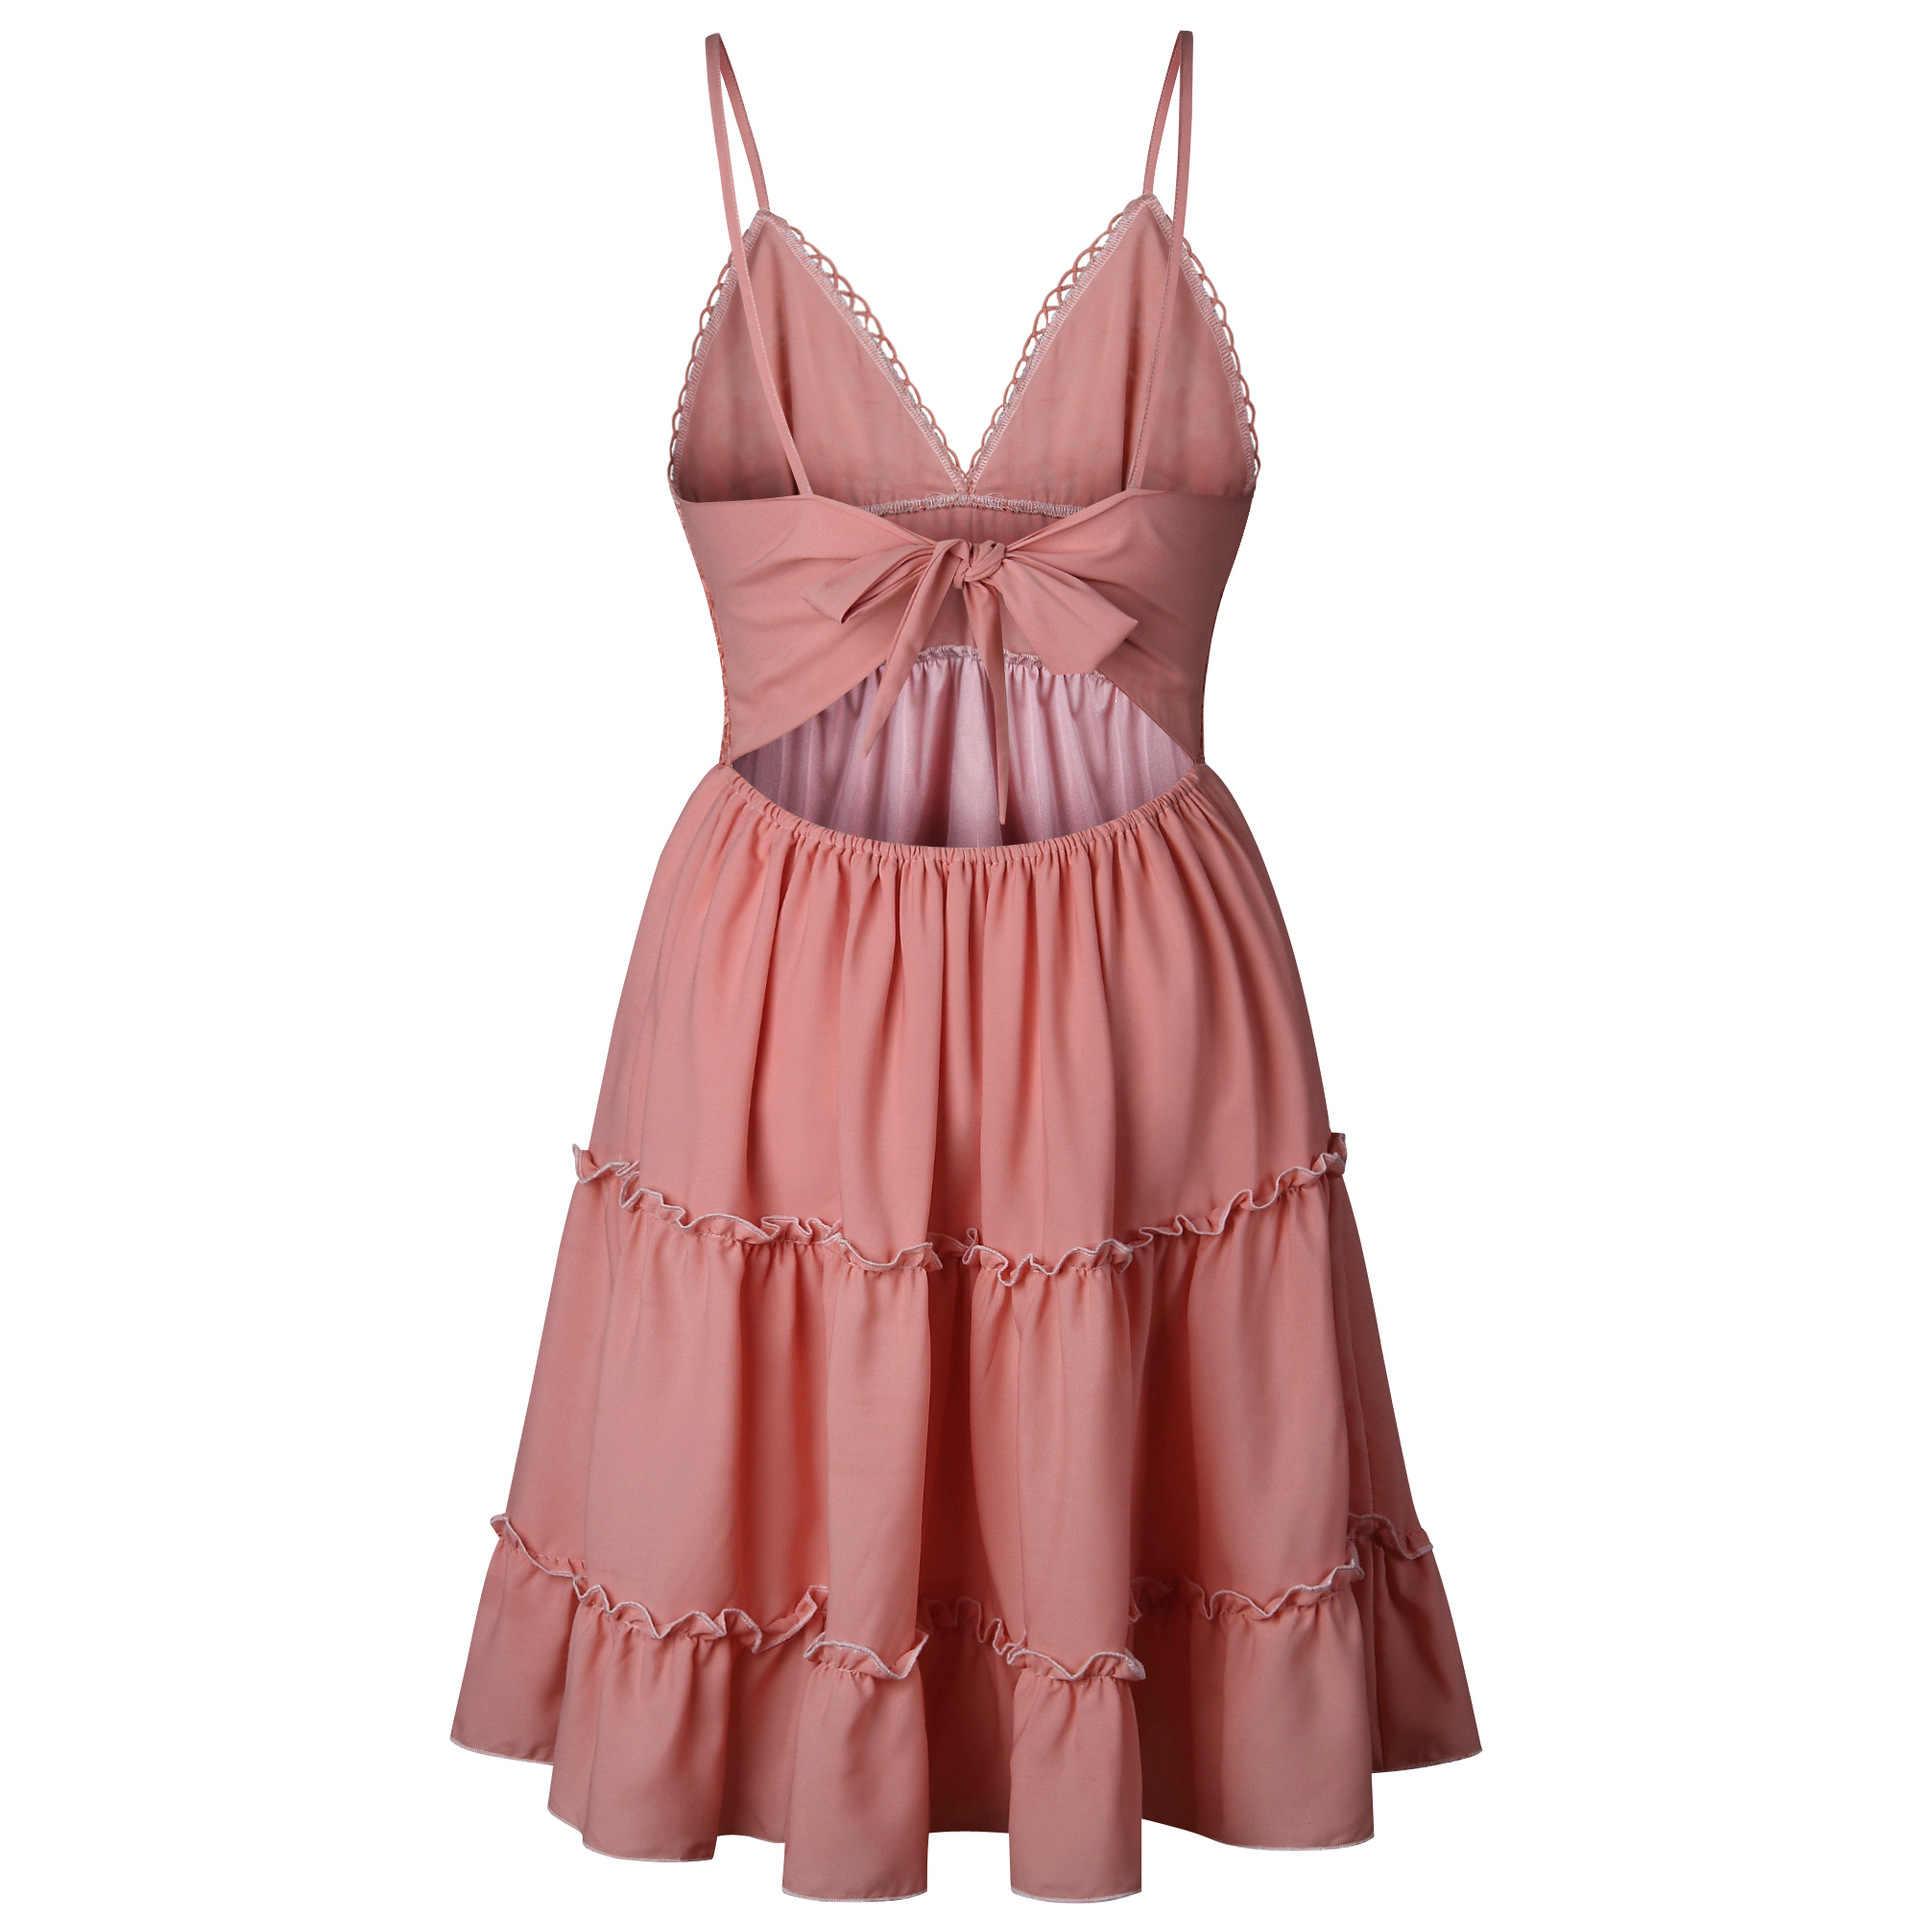 331d82f0f88 ... Summer Women Lace Dress Sexy Backless V-neck Beach Dresses 2018 Fashion  Sleeveless Spaghetti Strap ...